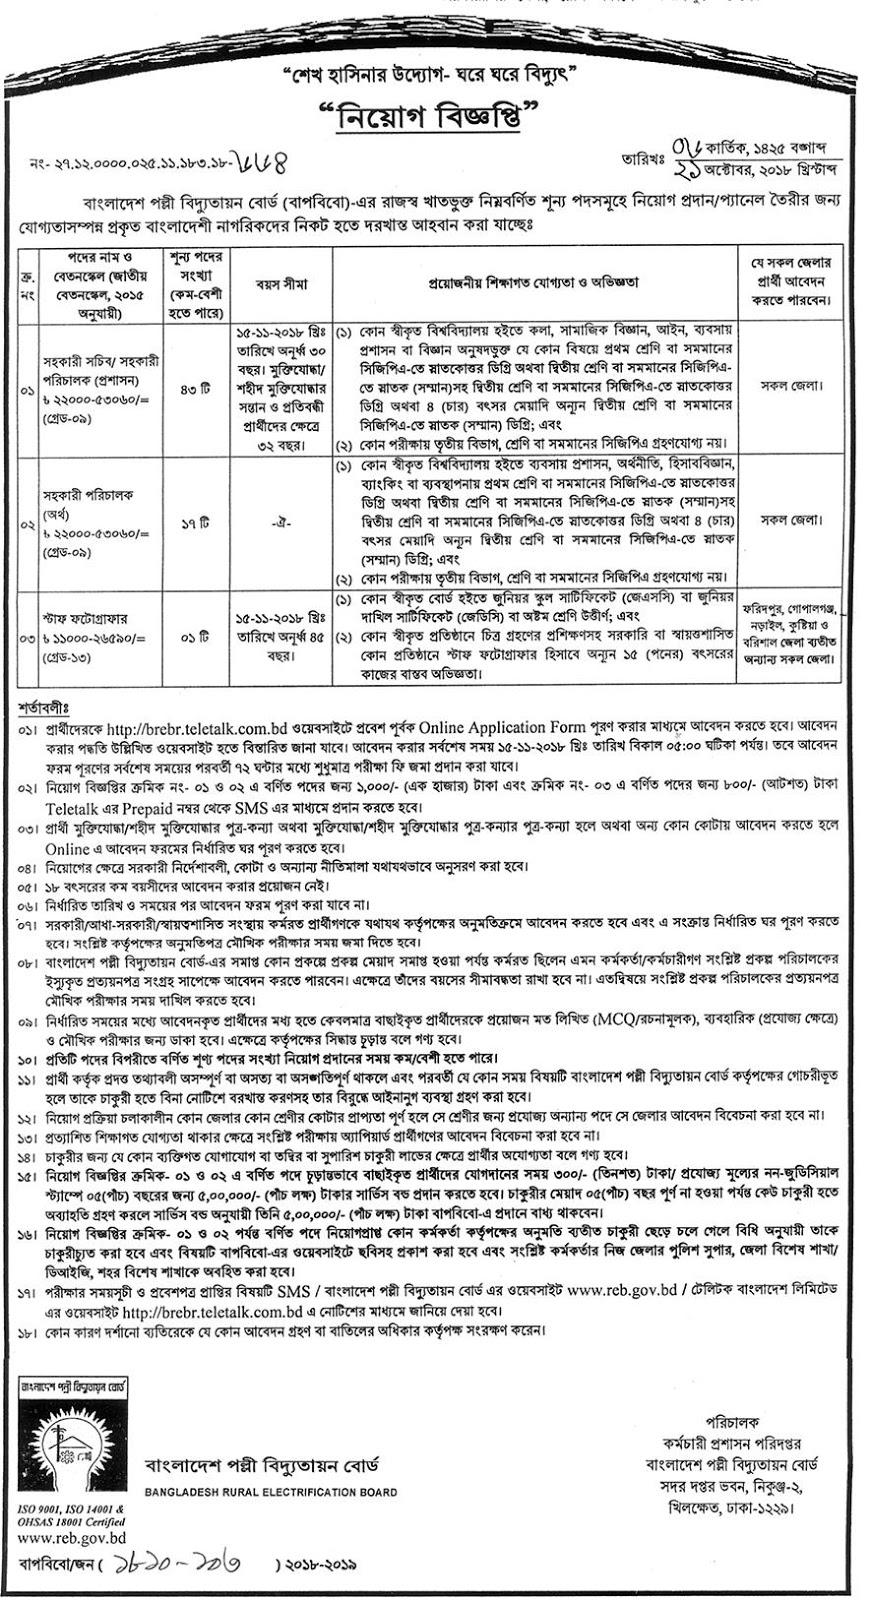 Bangladesh Rural Electrification Board (BREB) Job Circular 2018